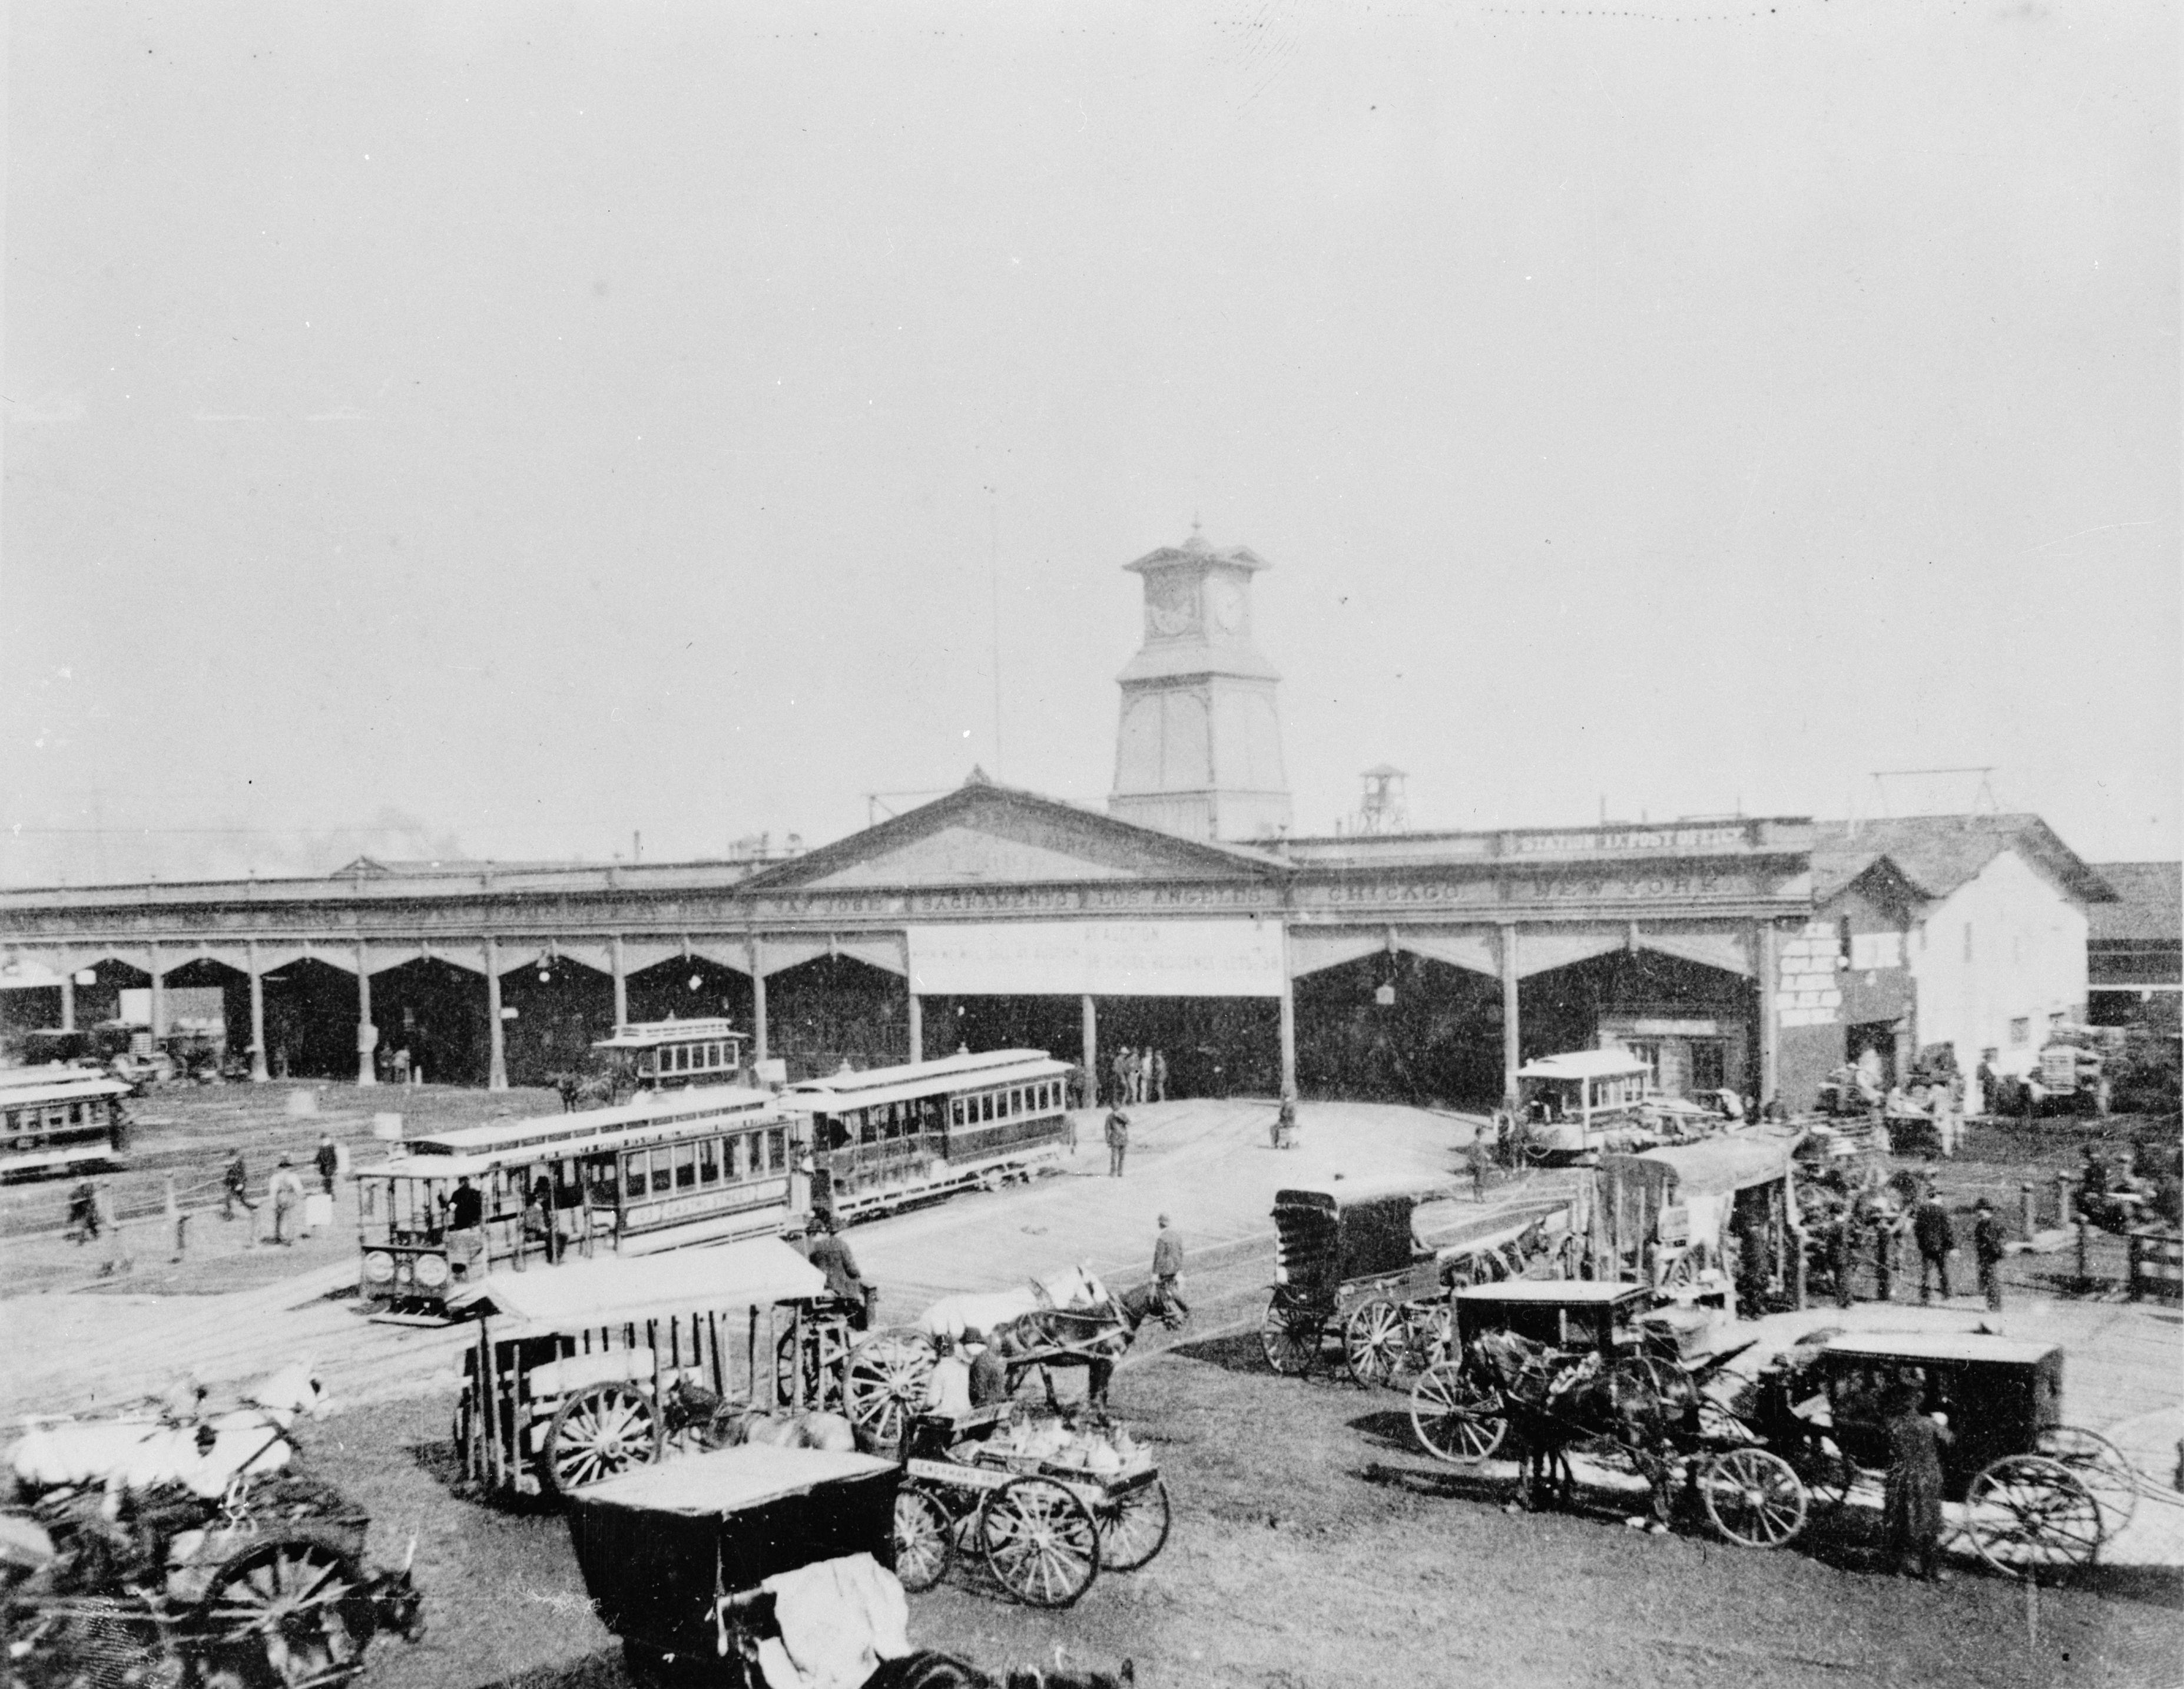 Union Depot & Ferry House, San Francisco, 1887.